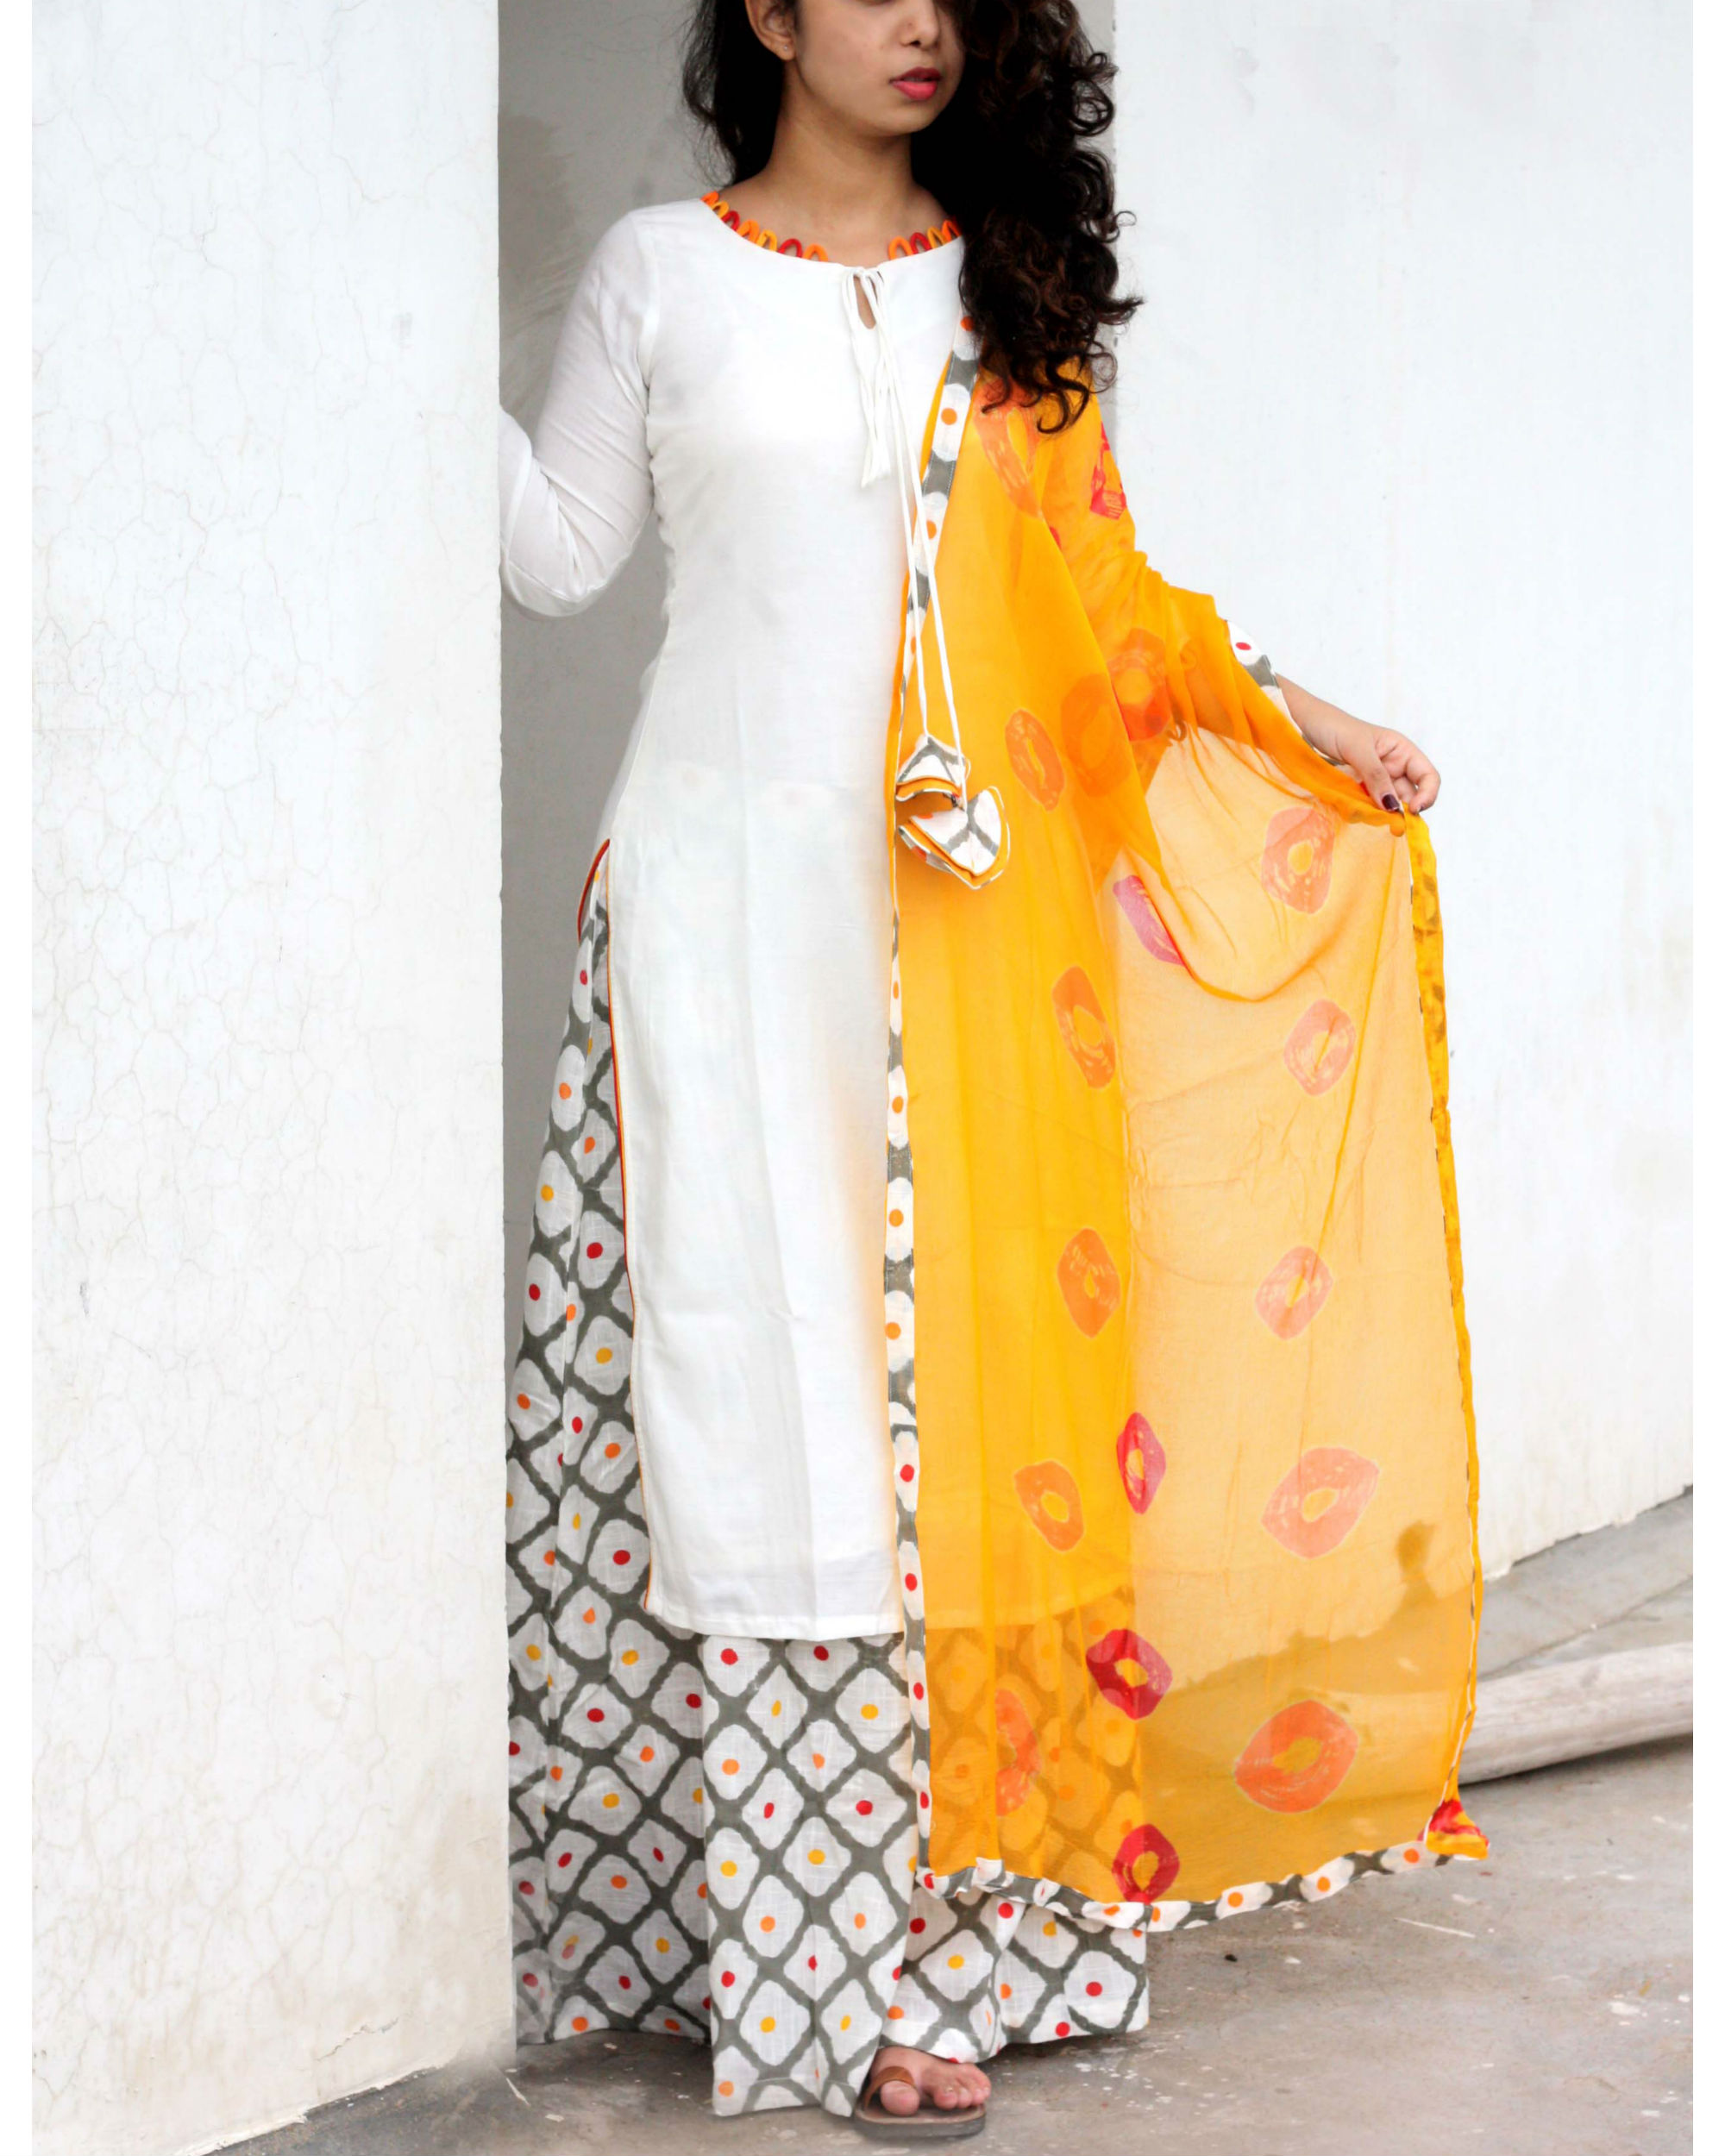 Ihram Kids For Sale Dubai: Off White Kurta With Printed Palazzo And Bandhej Dupatta